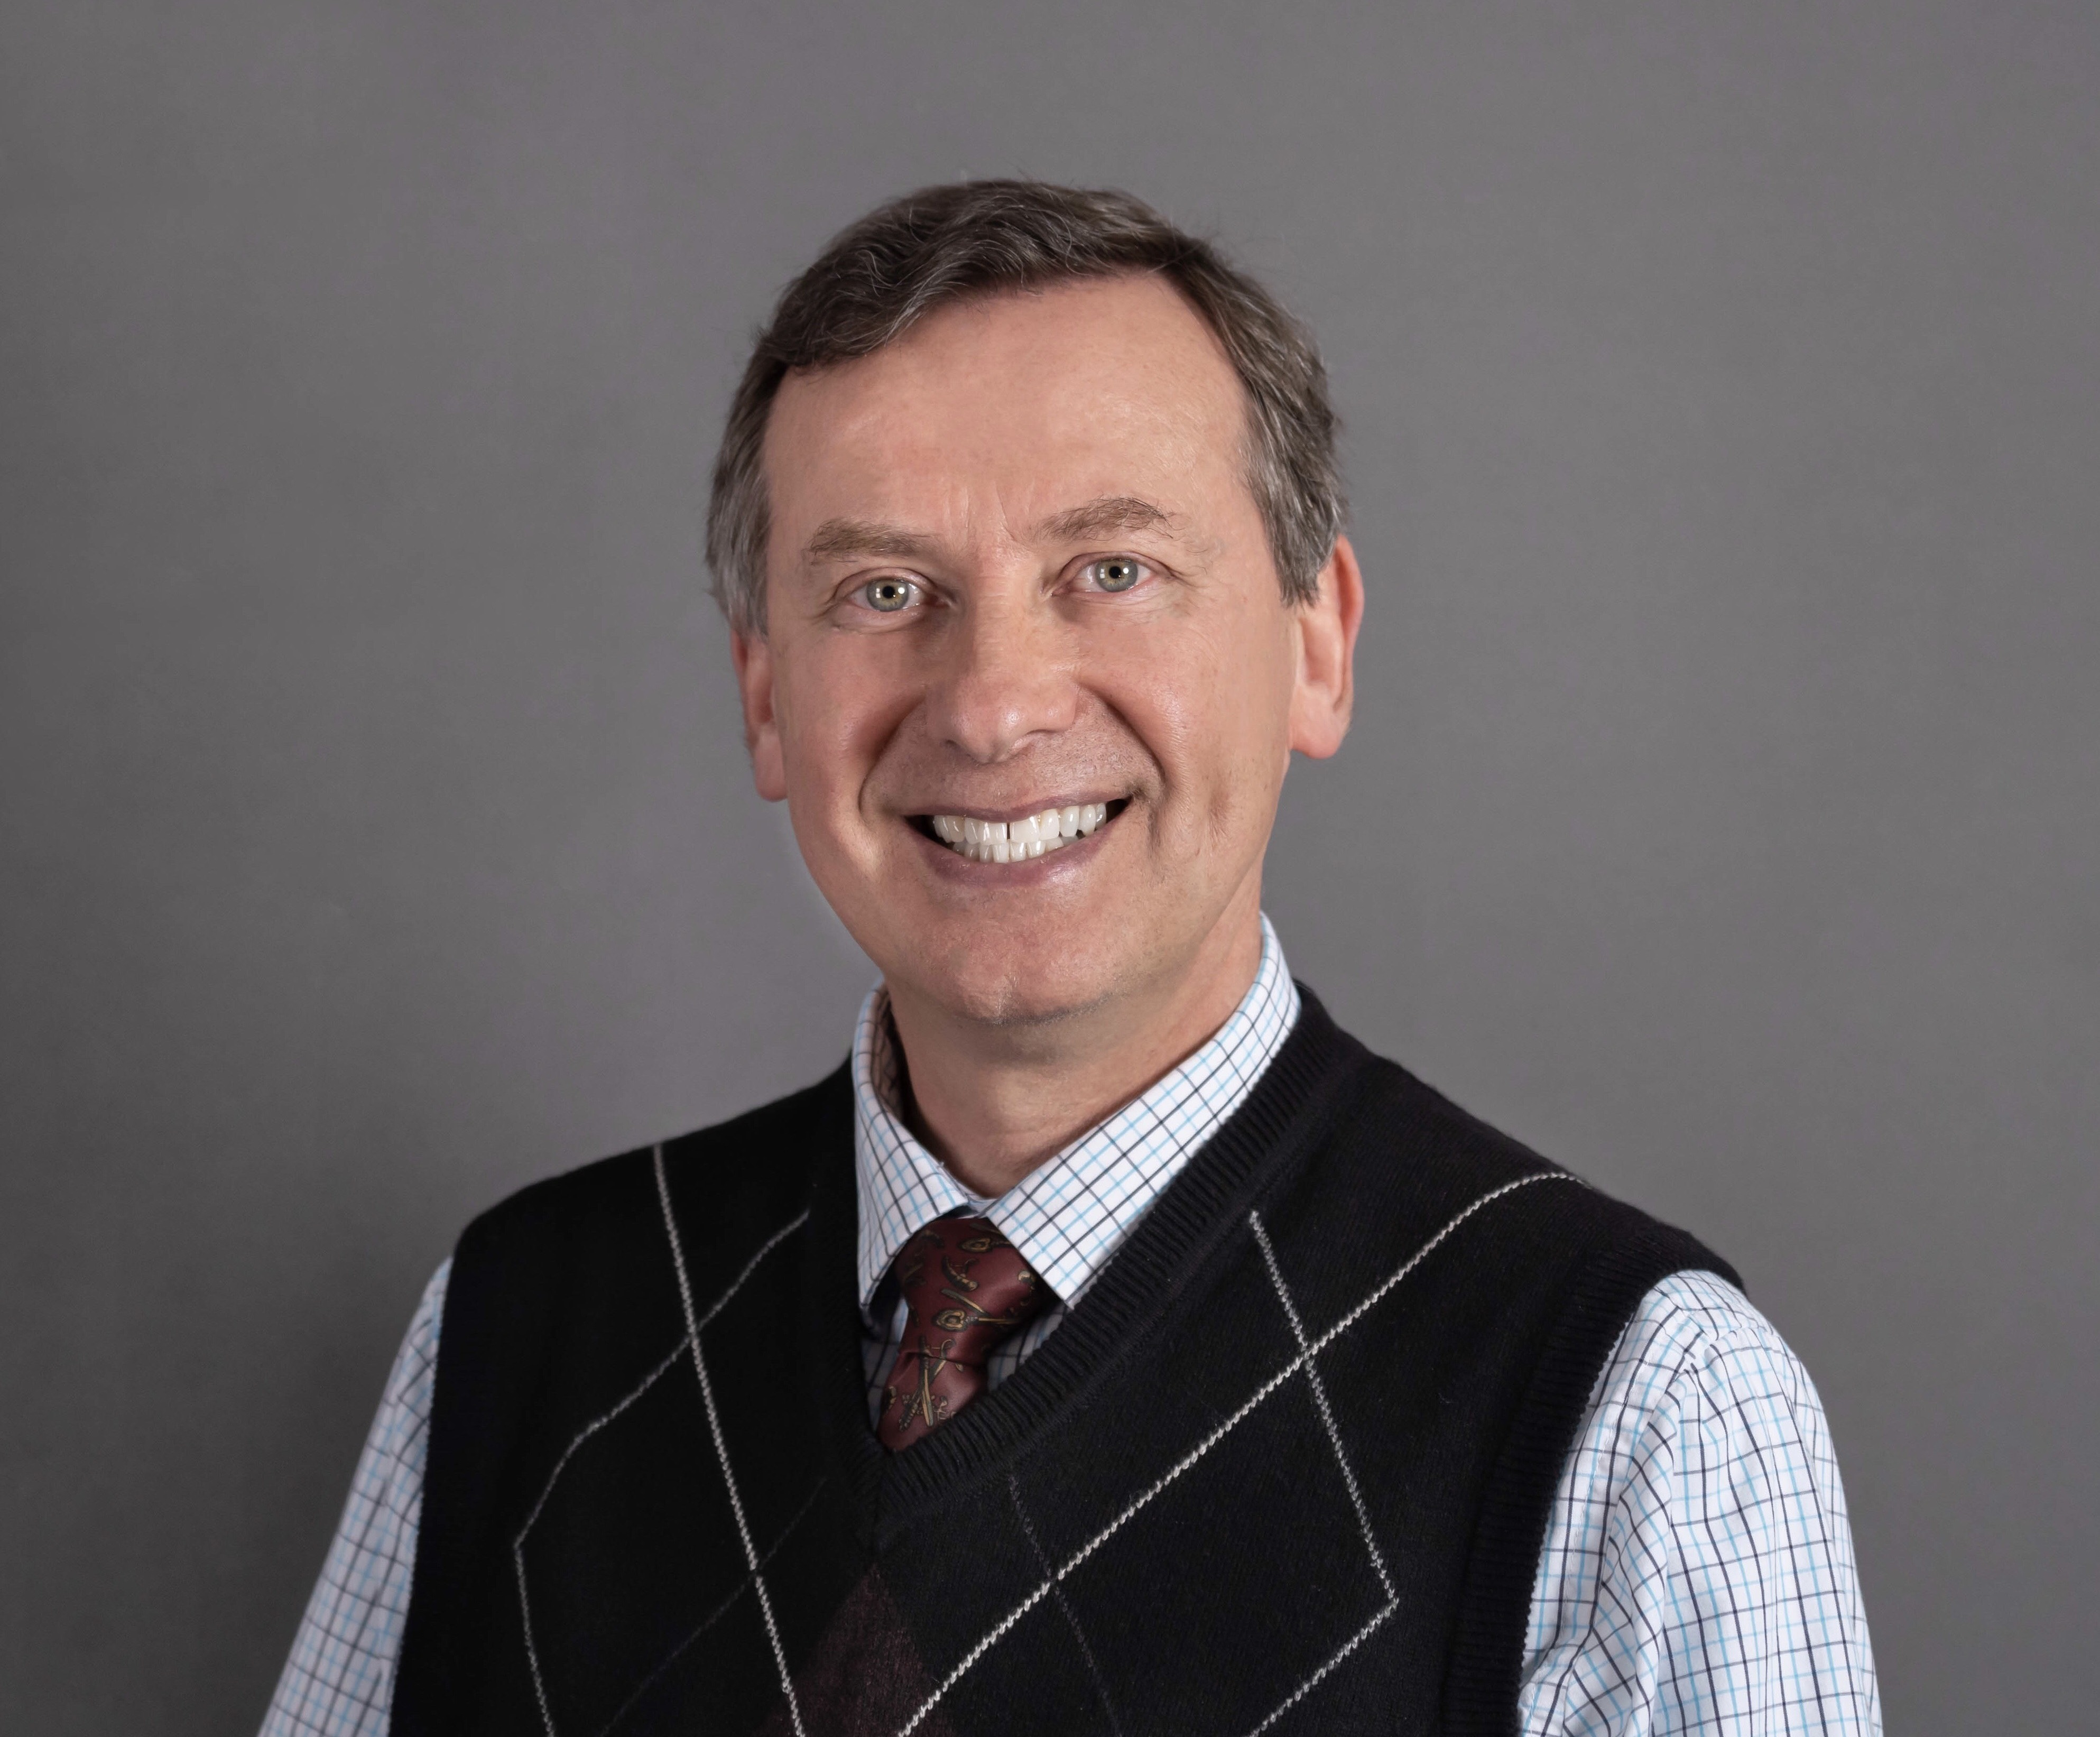 Keith Ware